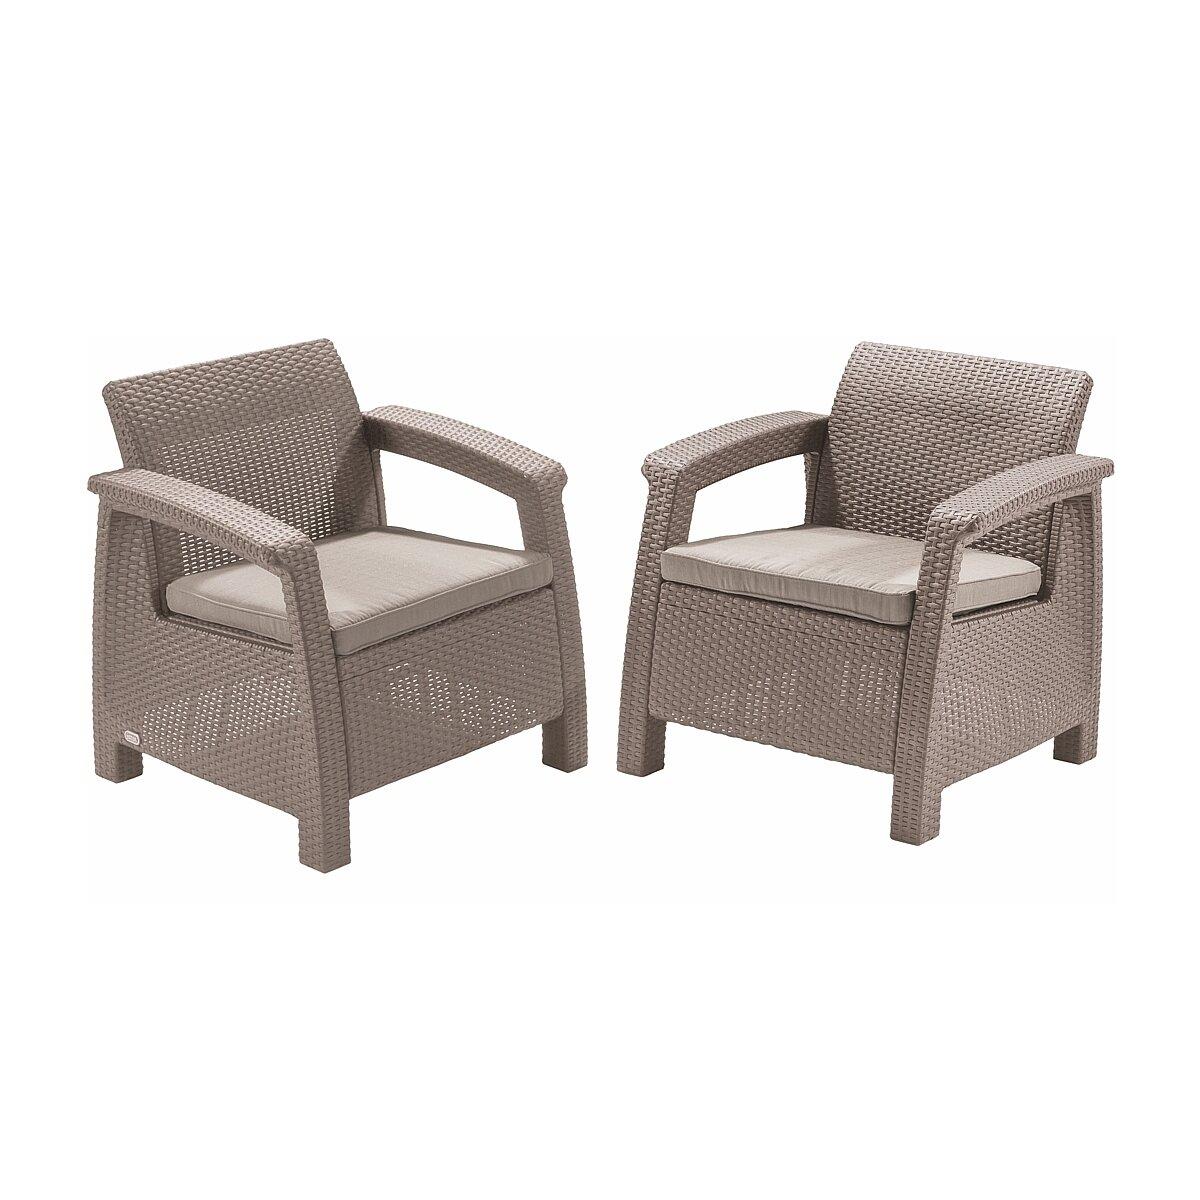 Кресла садовые cappuccino